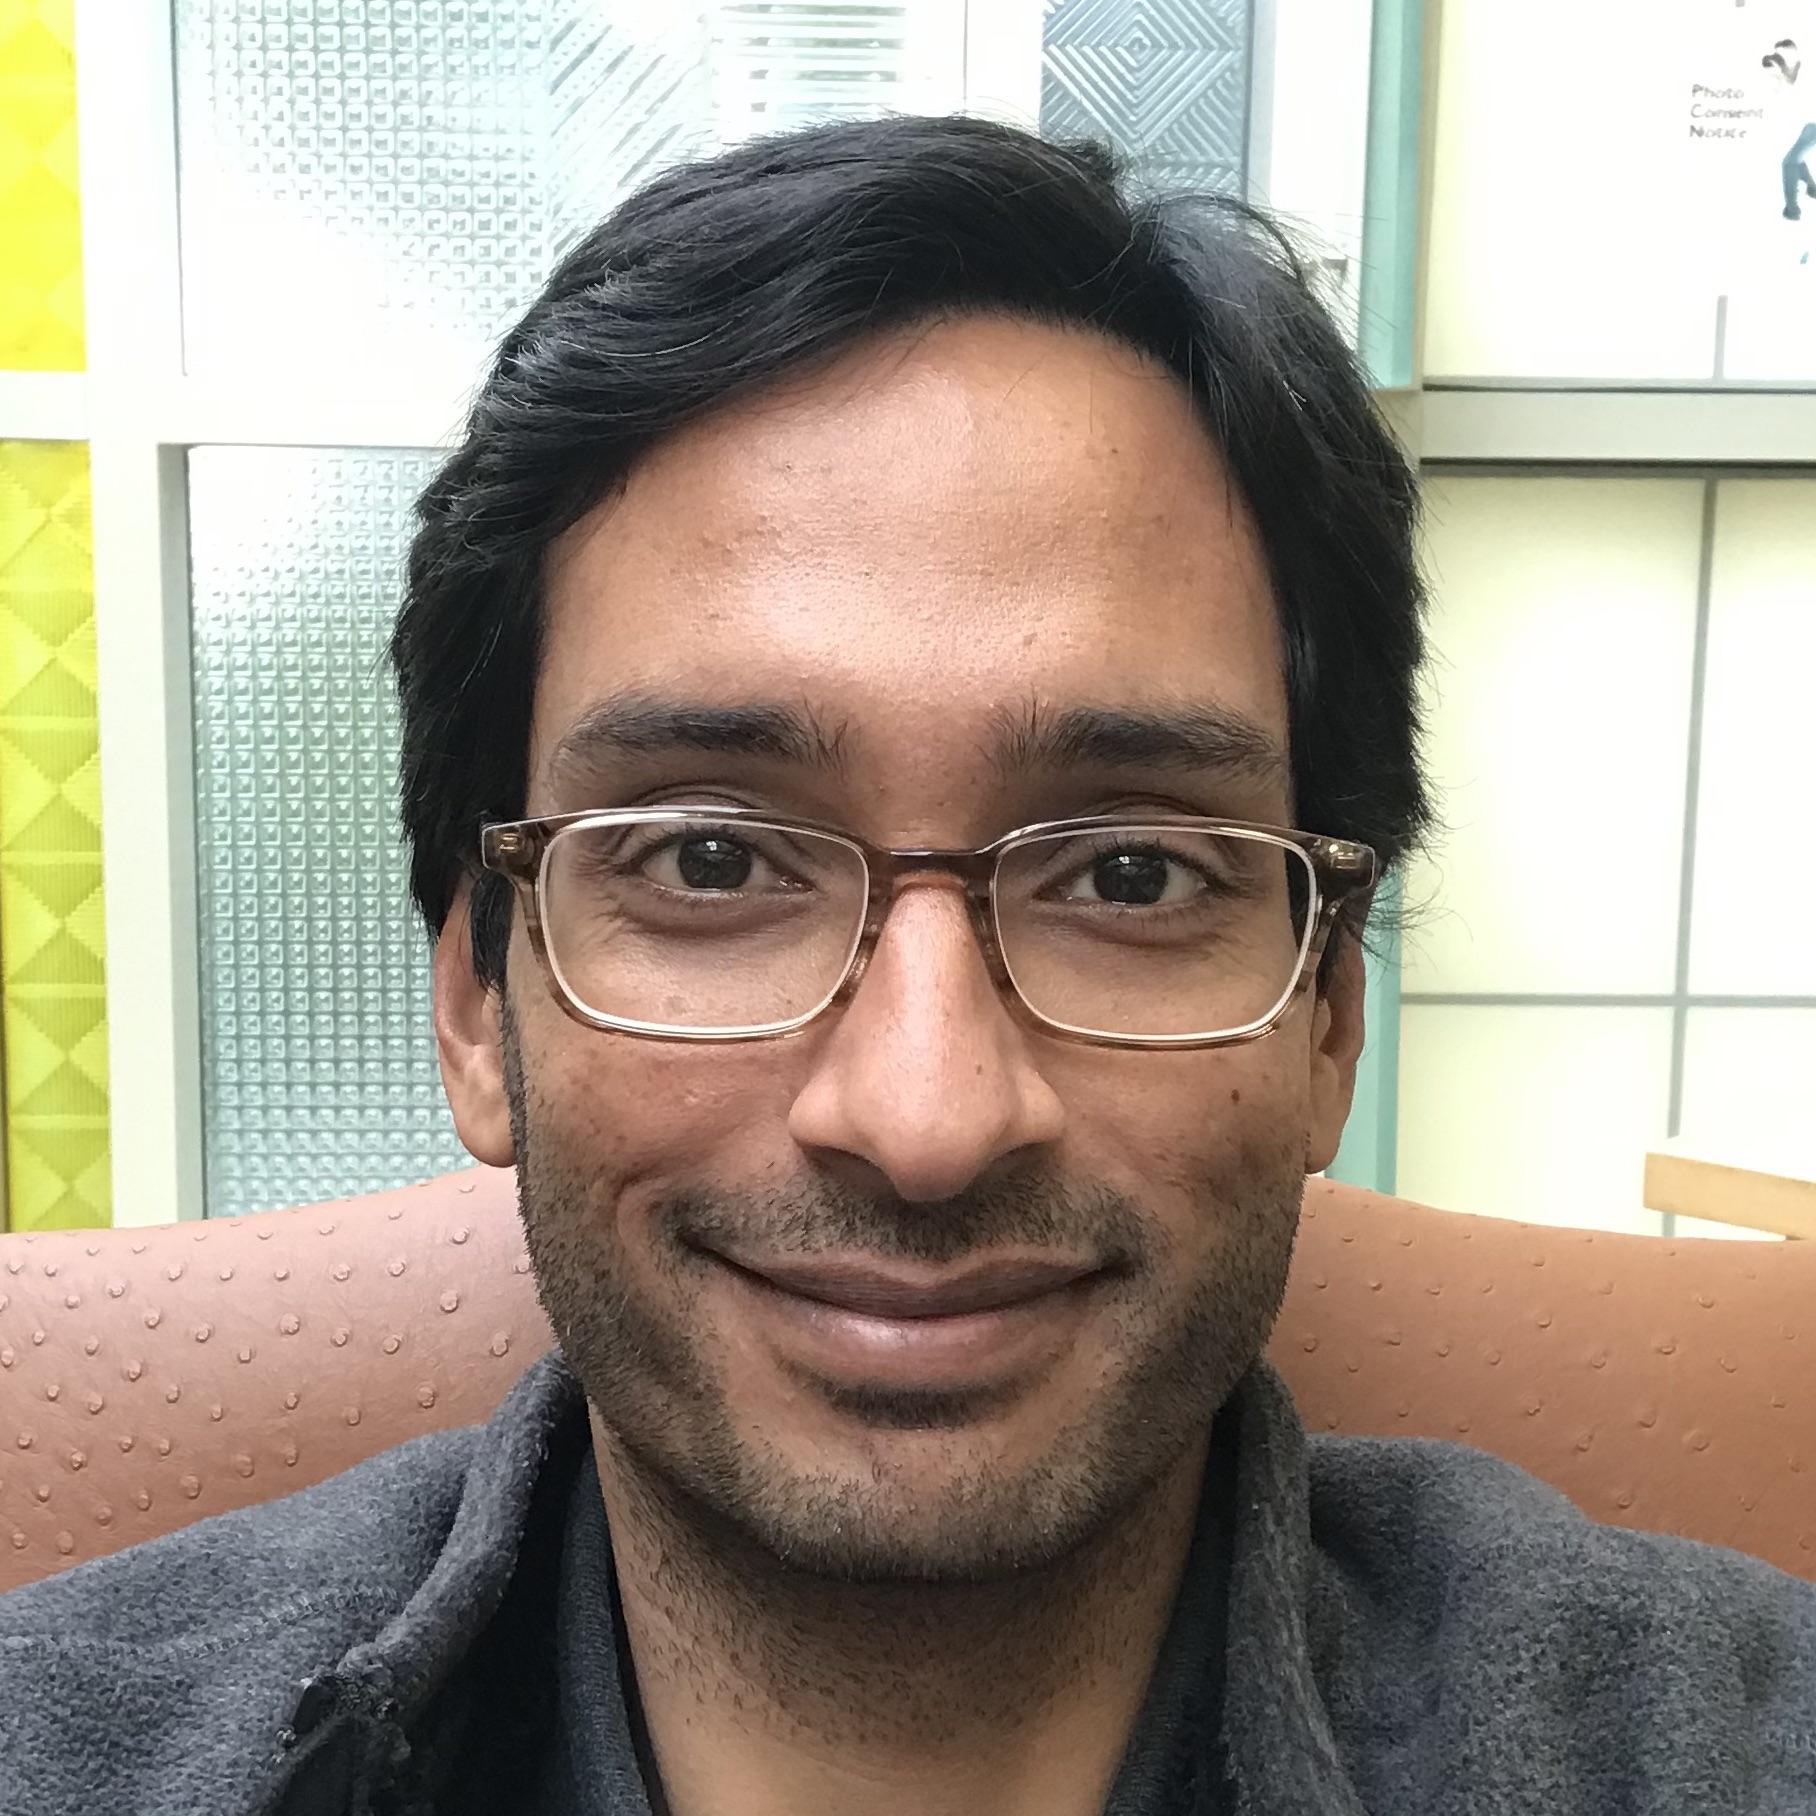 Profile picture of Snehal Banerjee